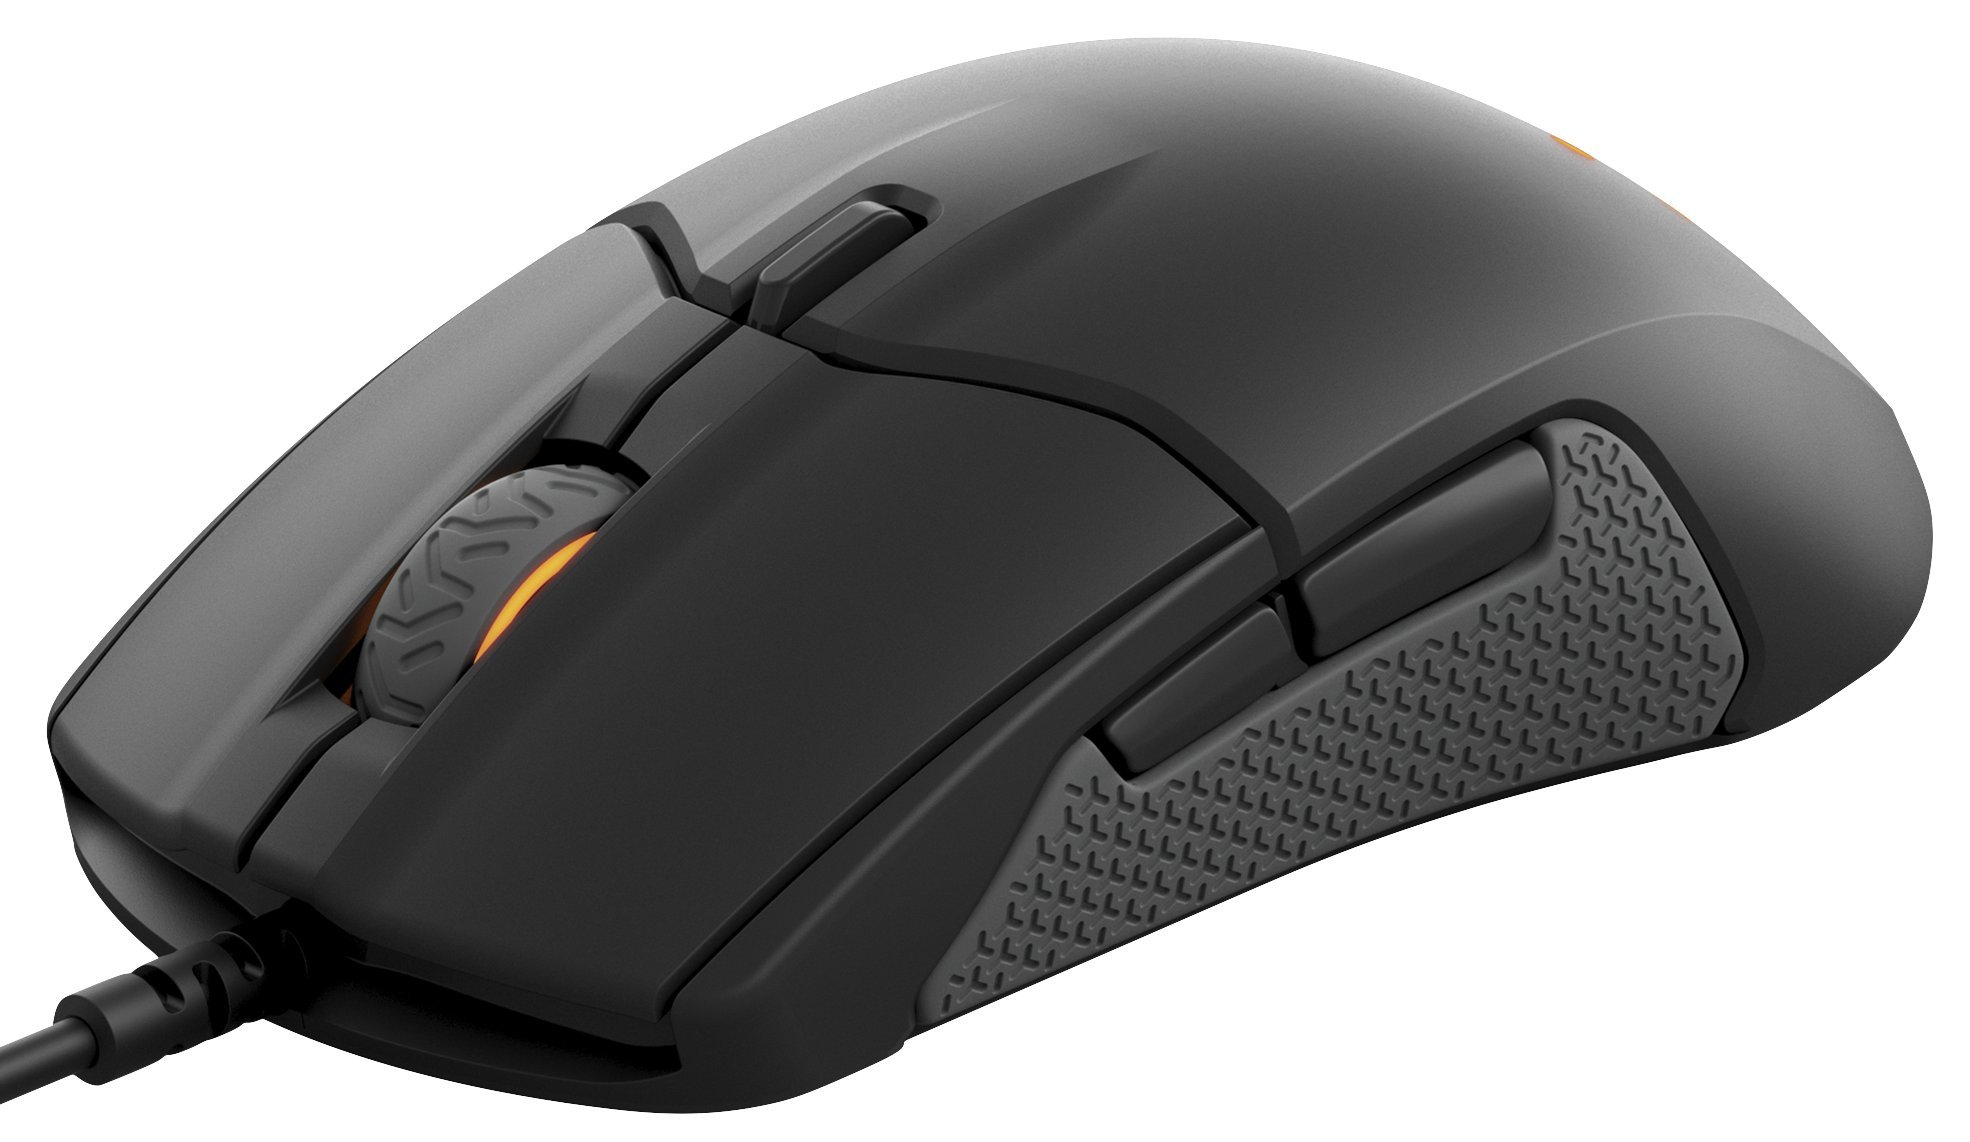 SteelSeries Sensei 310 Gaming Mouse - 12,000 CPI TrueMove3 Optical Sensor - Ambidextrous Design - Split-Trigger Buttons - RGB Lighting by SteelSeries (Image #3)